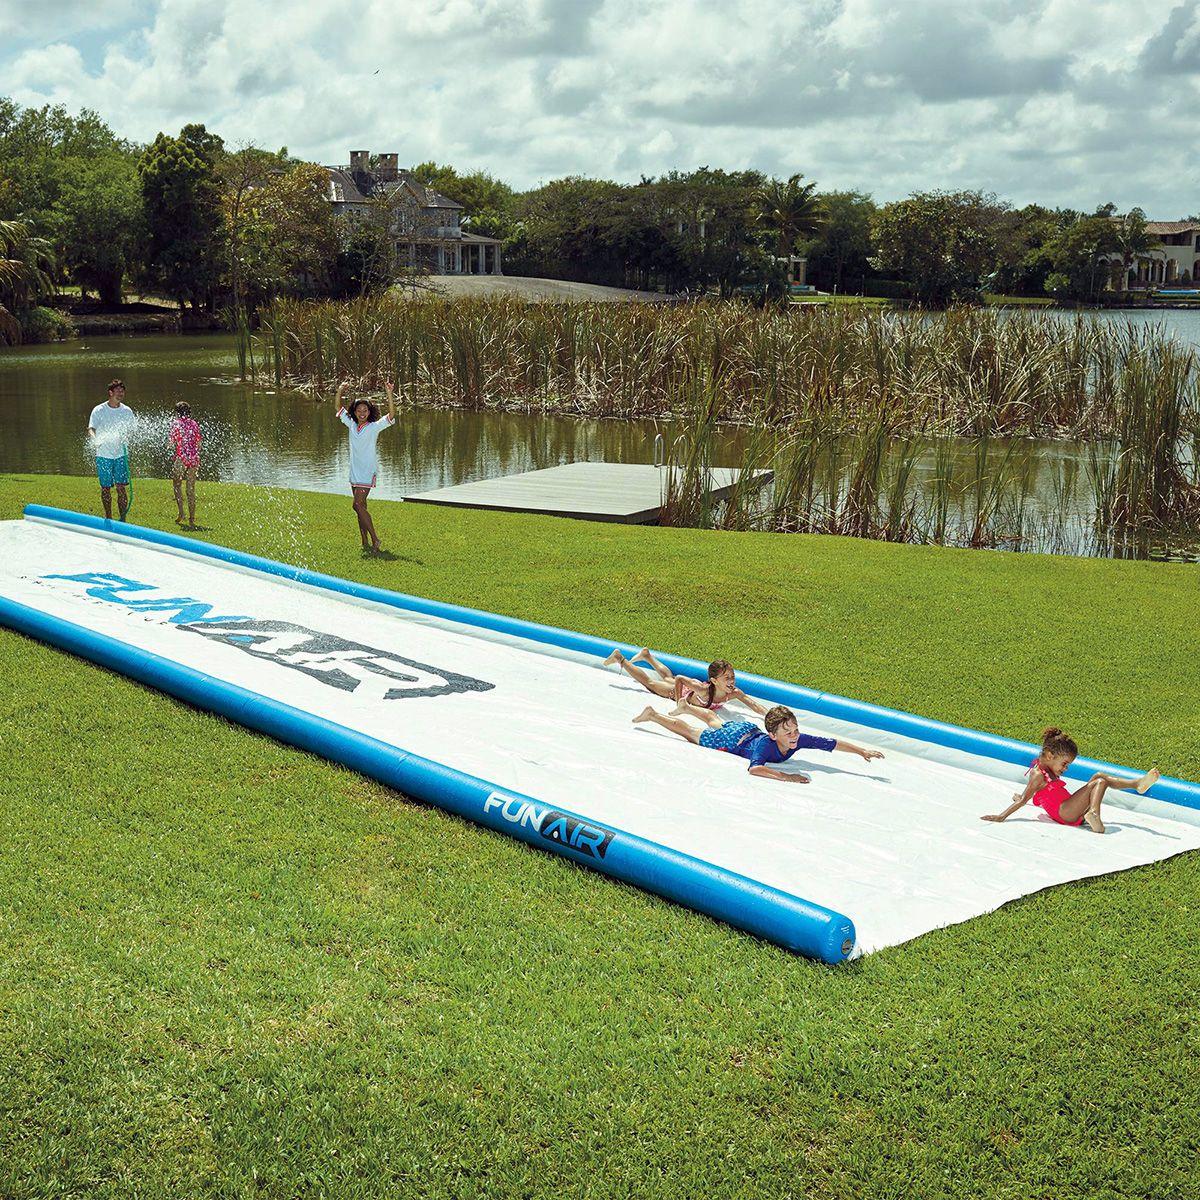 Gigantic Backyard Water Slide in 2020 | Water slides, Slip ...